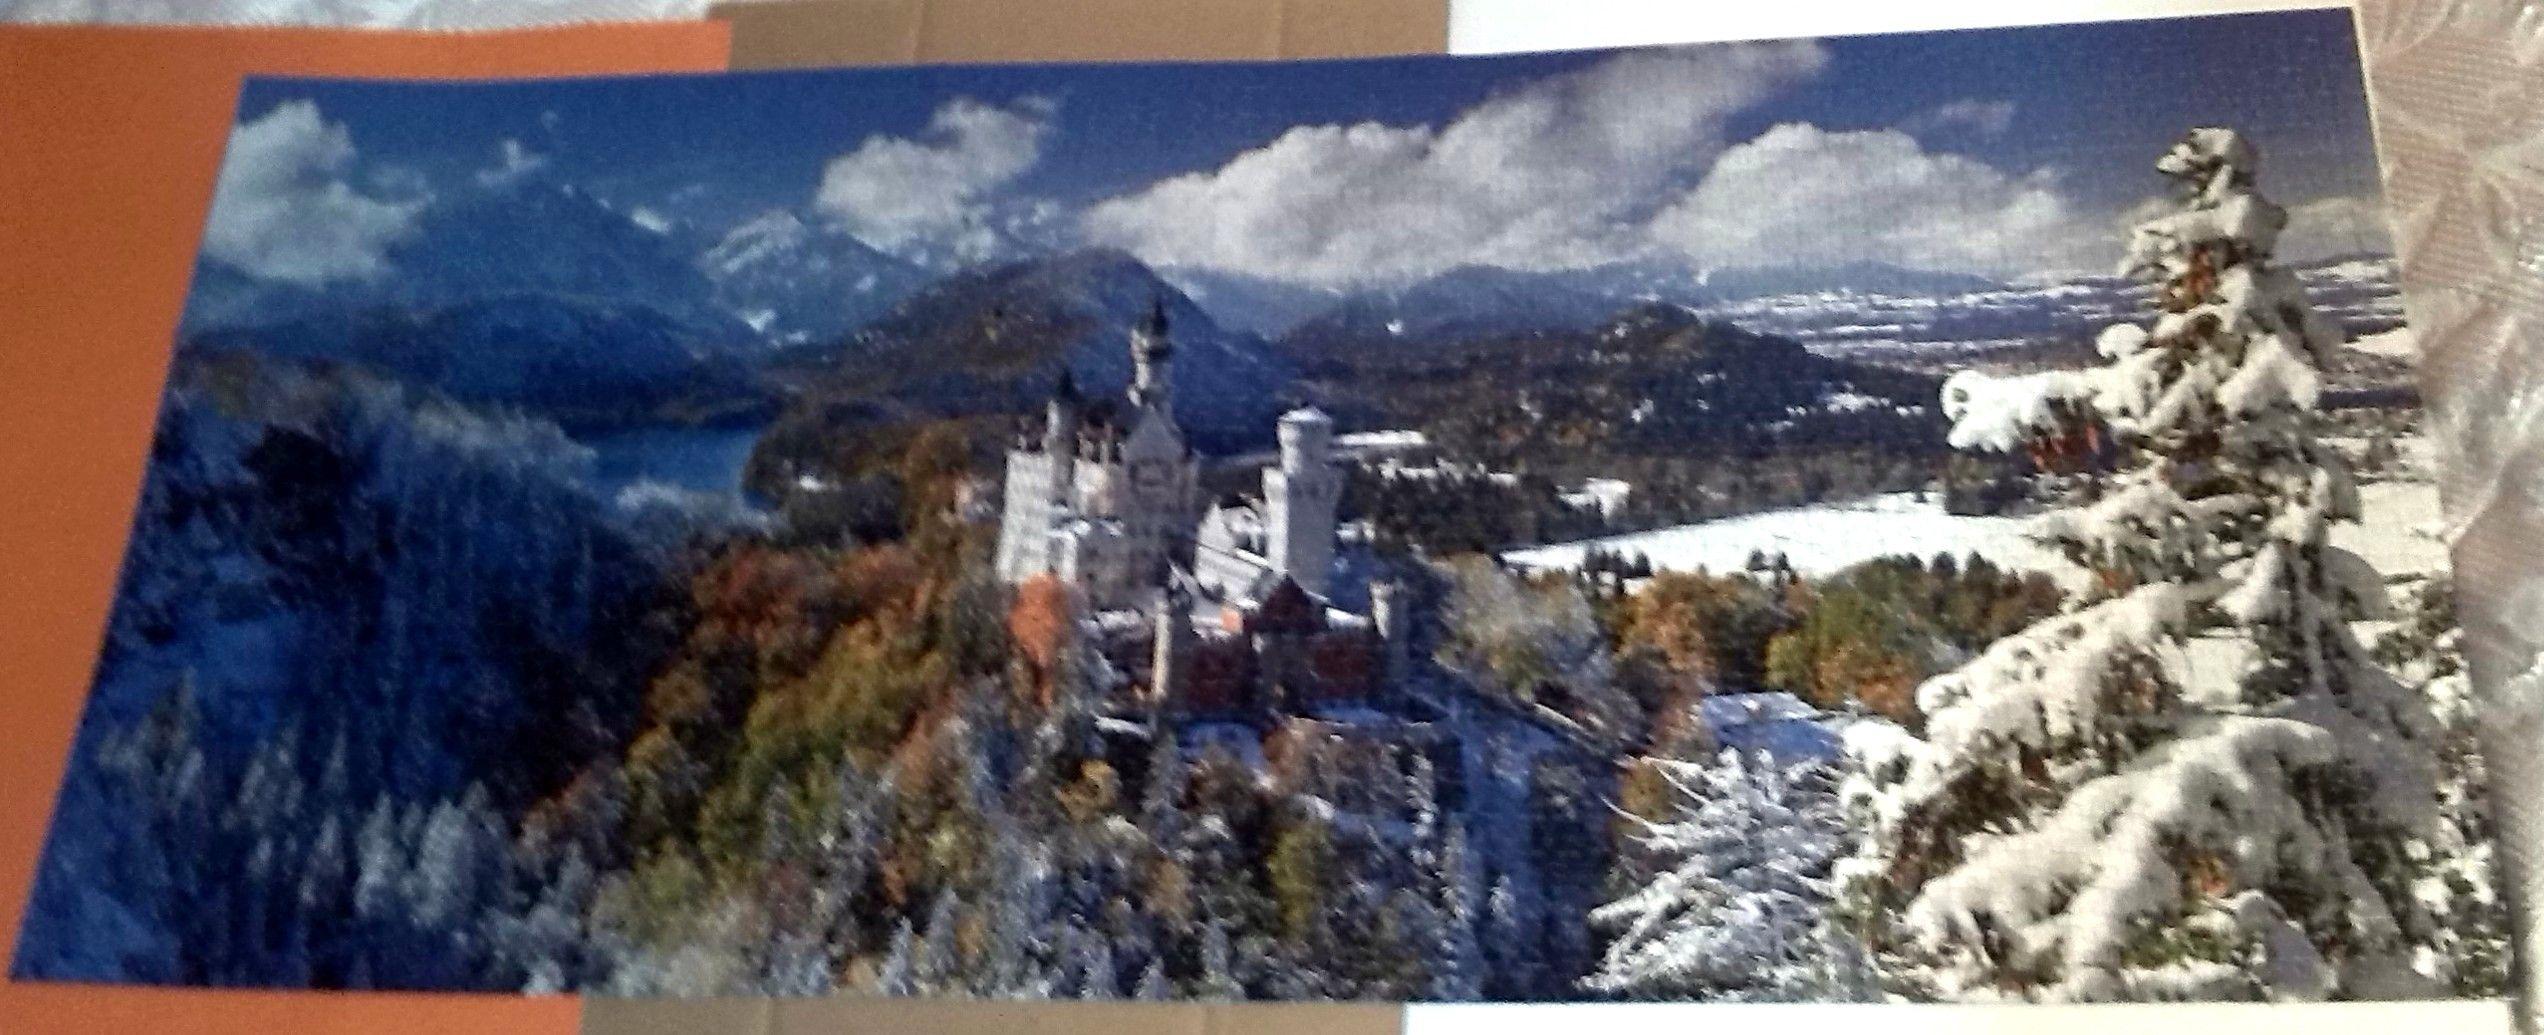 Neuschwanstein Castle 2000 Pieces Ravensburger Puslespill